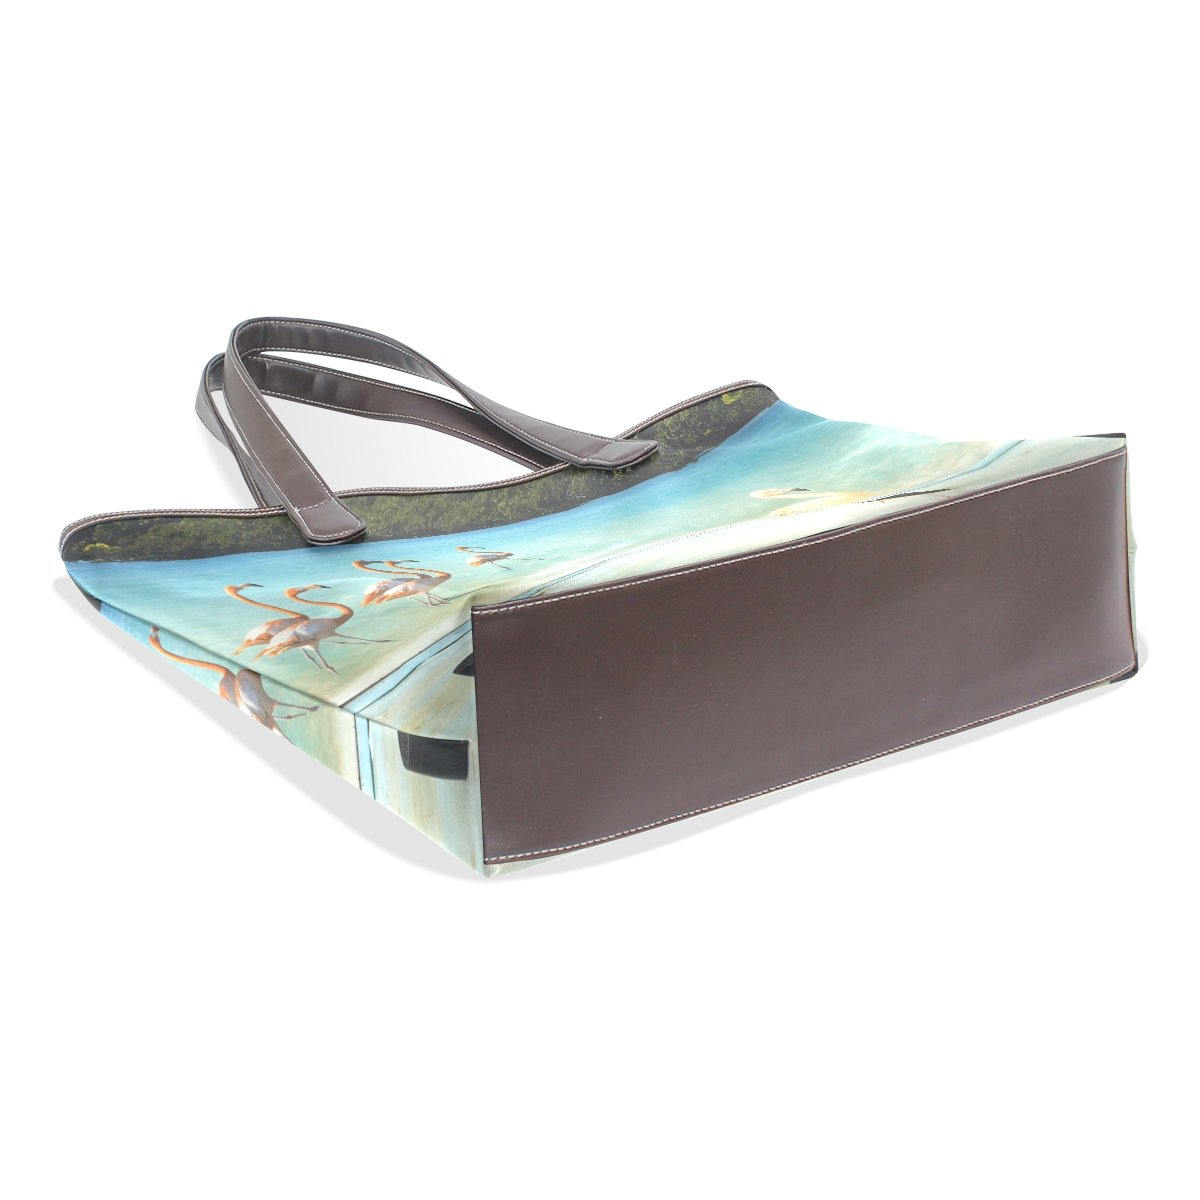 SCDS Flamingos PU Leather Lady Handbag Tote Bag Zipper Shoulder Bag